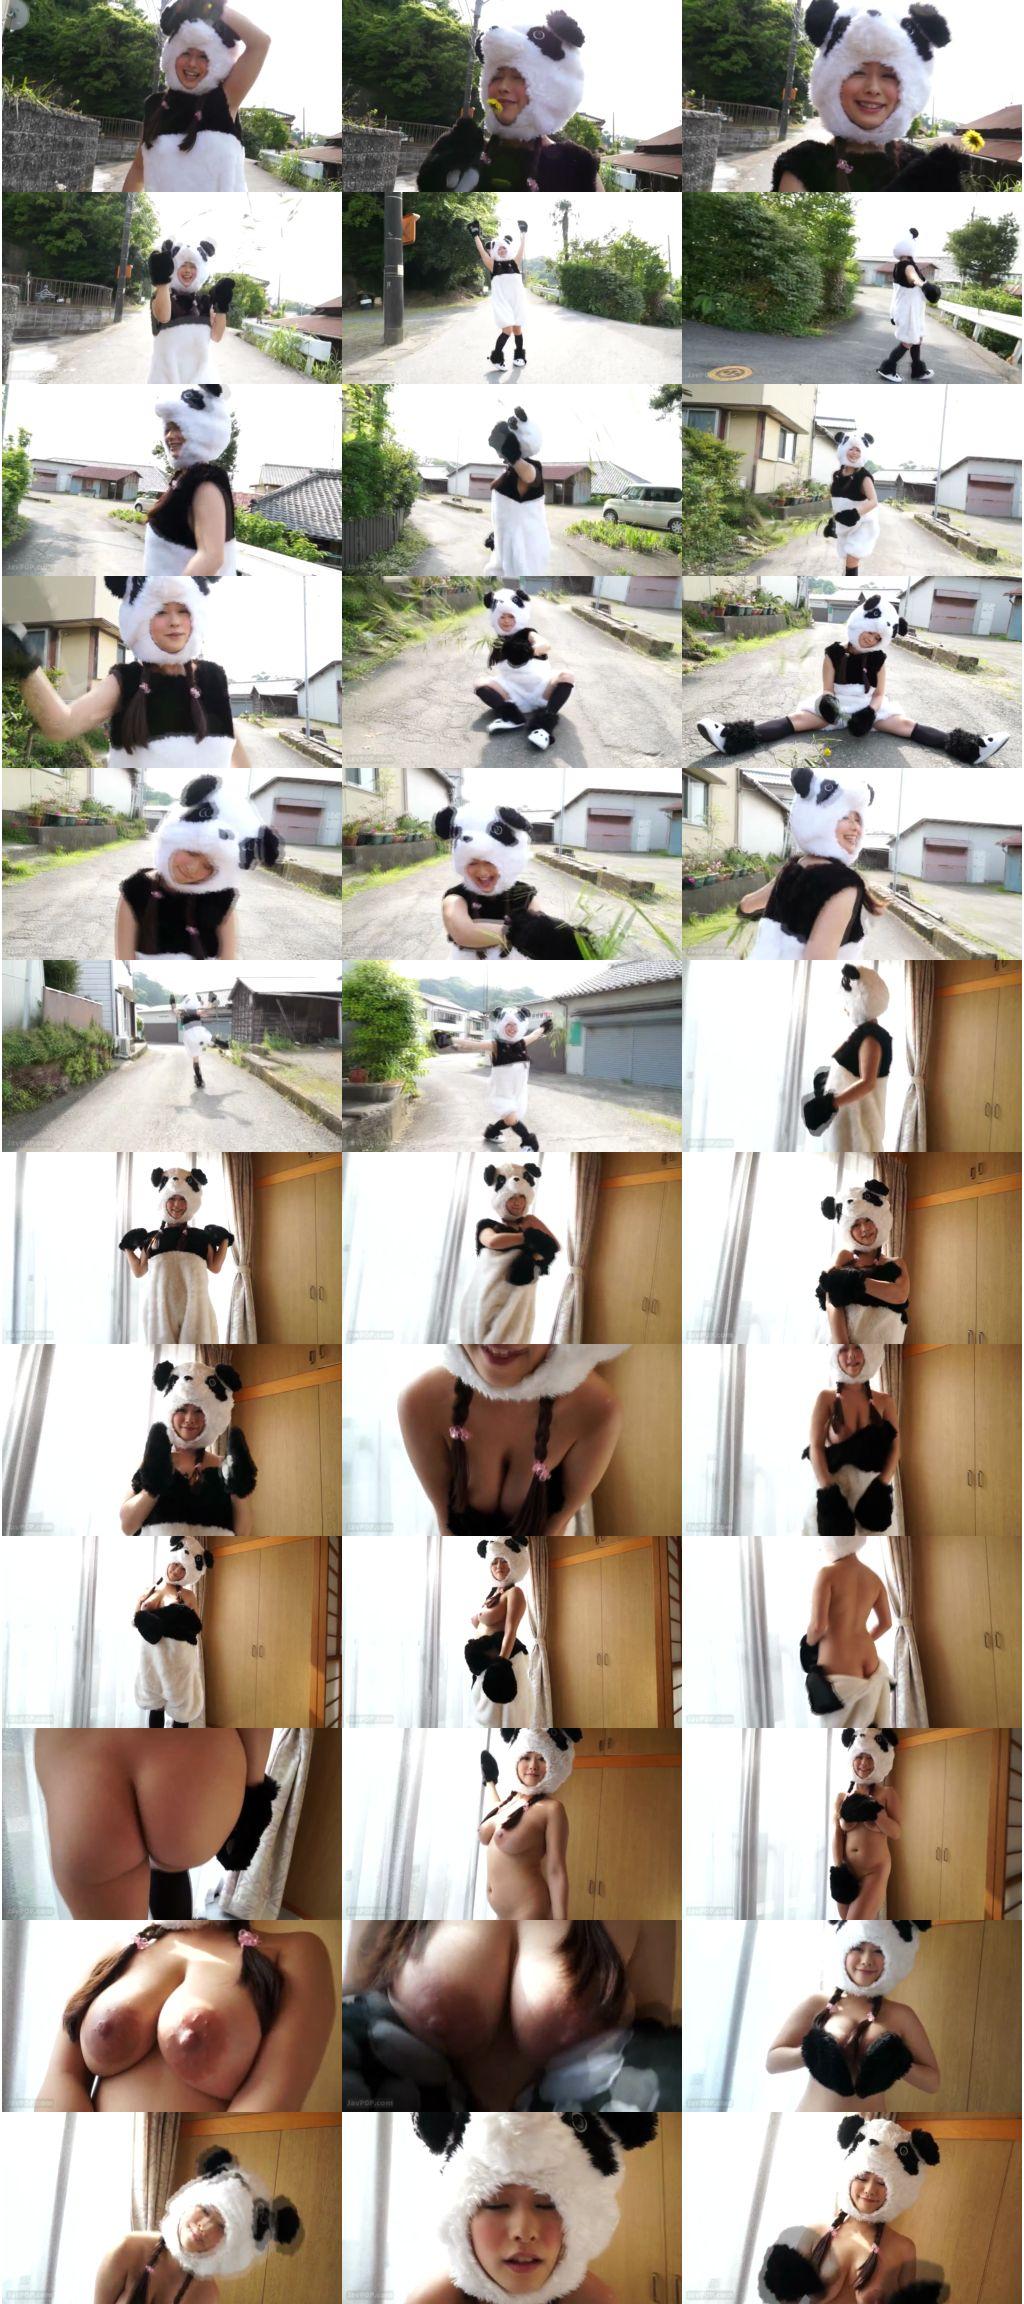 bgrp 004 s - [BGRP-004] 白石茉莉奈が好きすぎて白石茉莉奈が彼女になってた (ブルーレイディスク) Blu-ray(ブルーレイ) 芸能人 GRAPHIS Blu-ray Shiraishi Marina